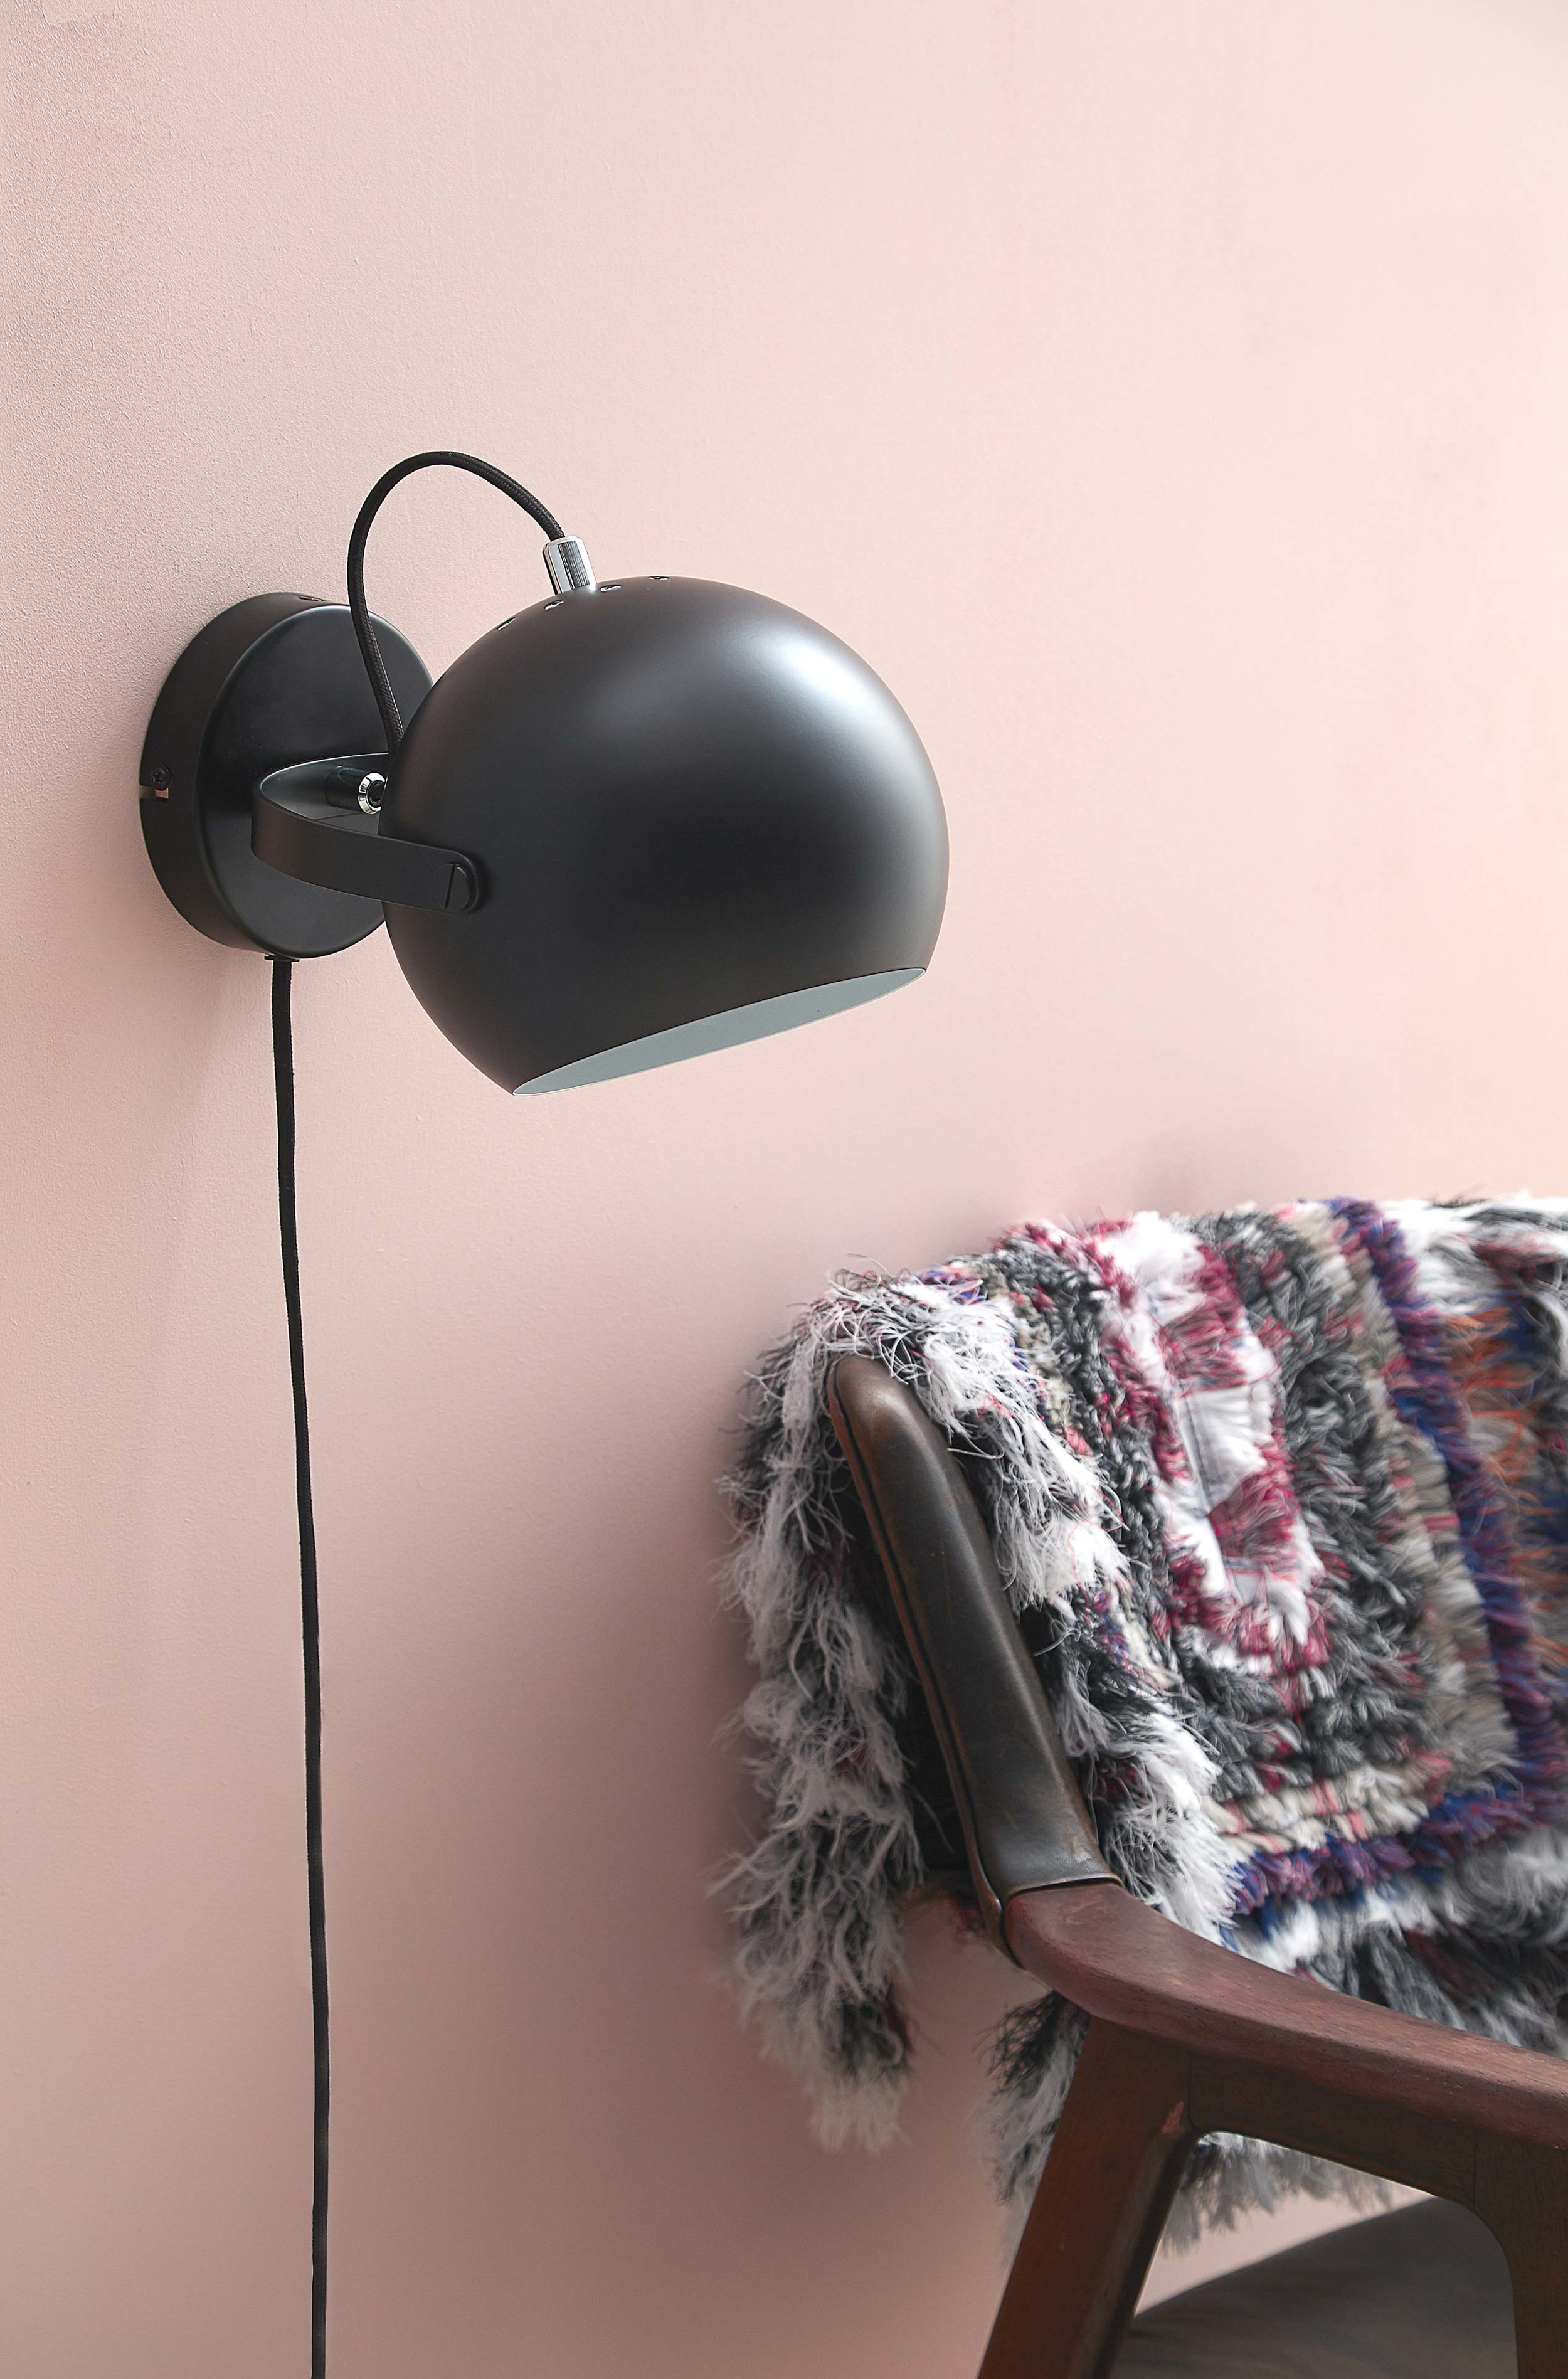 Ball-with-handle-wall-lamp-black-matt---lifestyle-Studio-Horsens-4354.jpg